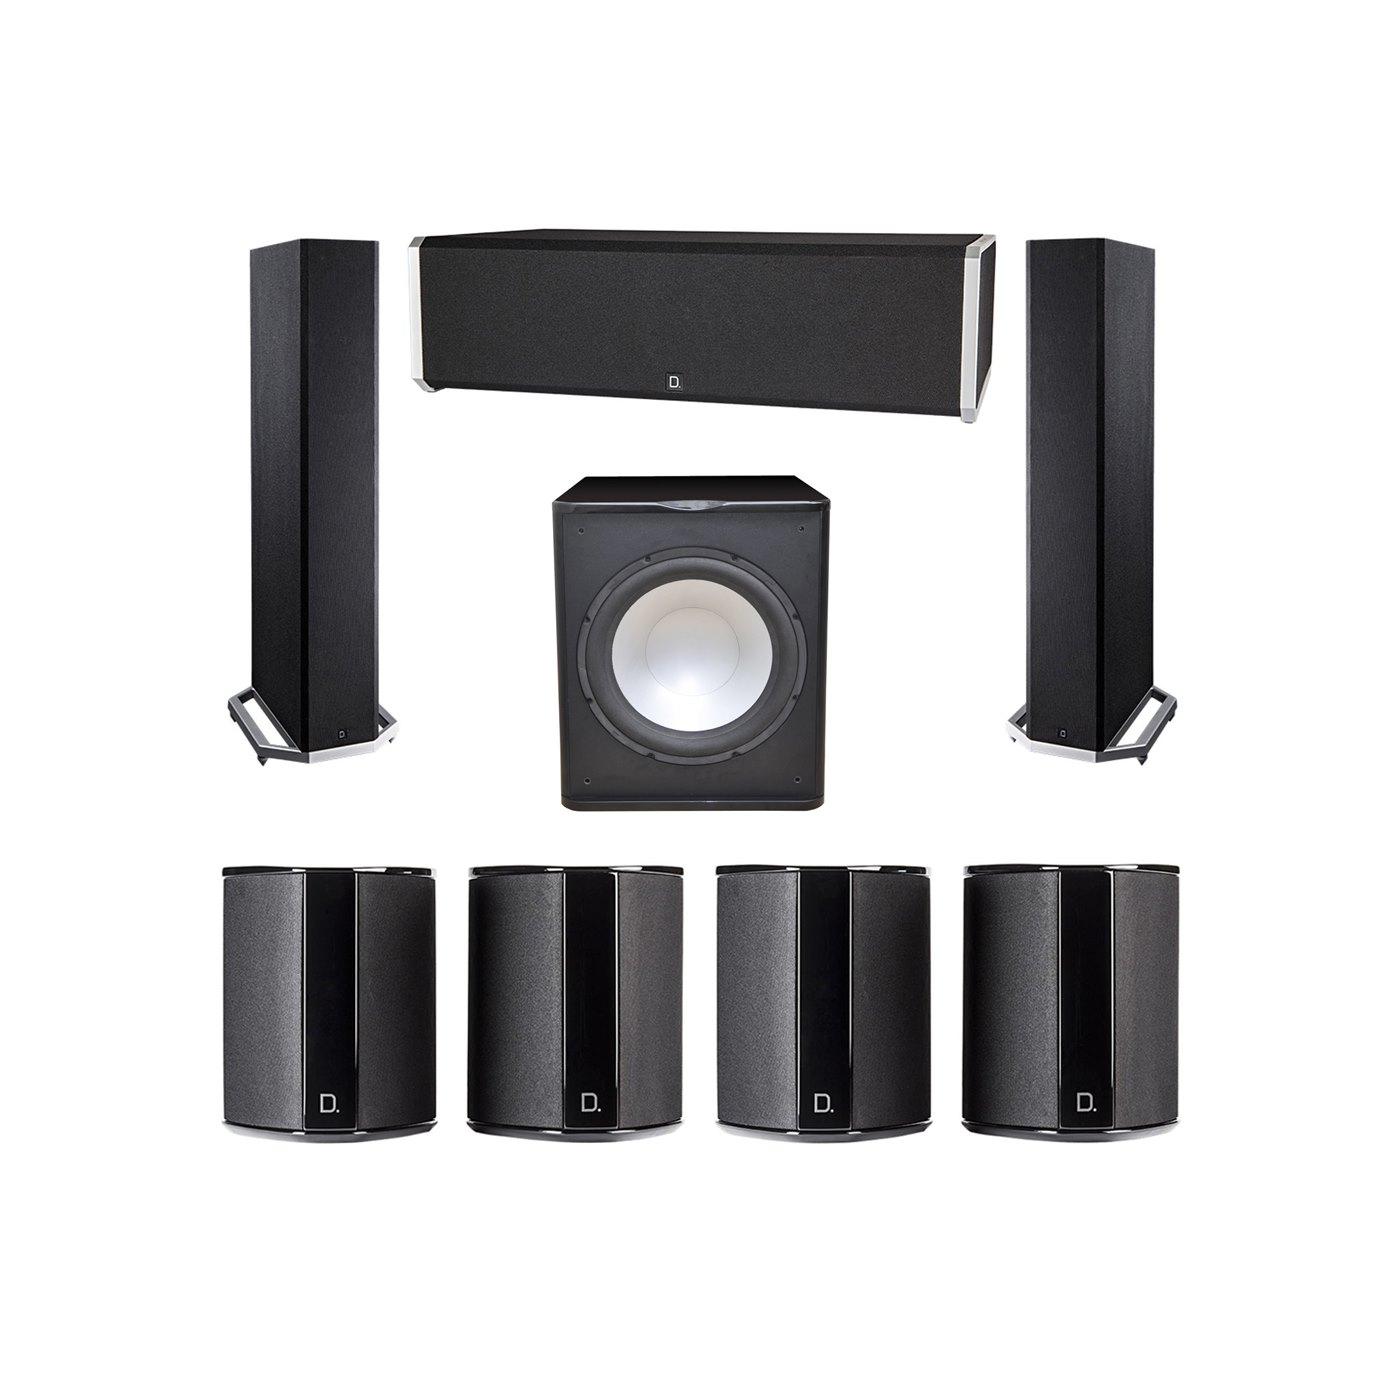 Definitive Technology 7.1 System with 2 BP9020 Tower Speakers, 1 CS9040 Center Channel Speaker, 4 SR9040 Surround Speaker, 1 Premier Acoustic PA-150 Subwoofer